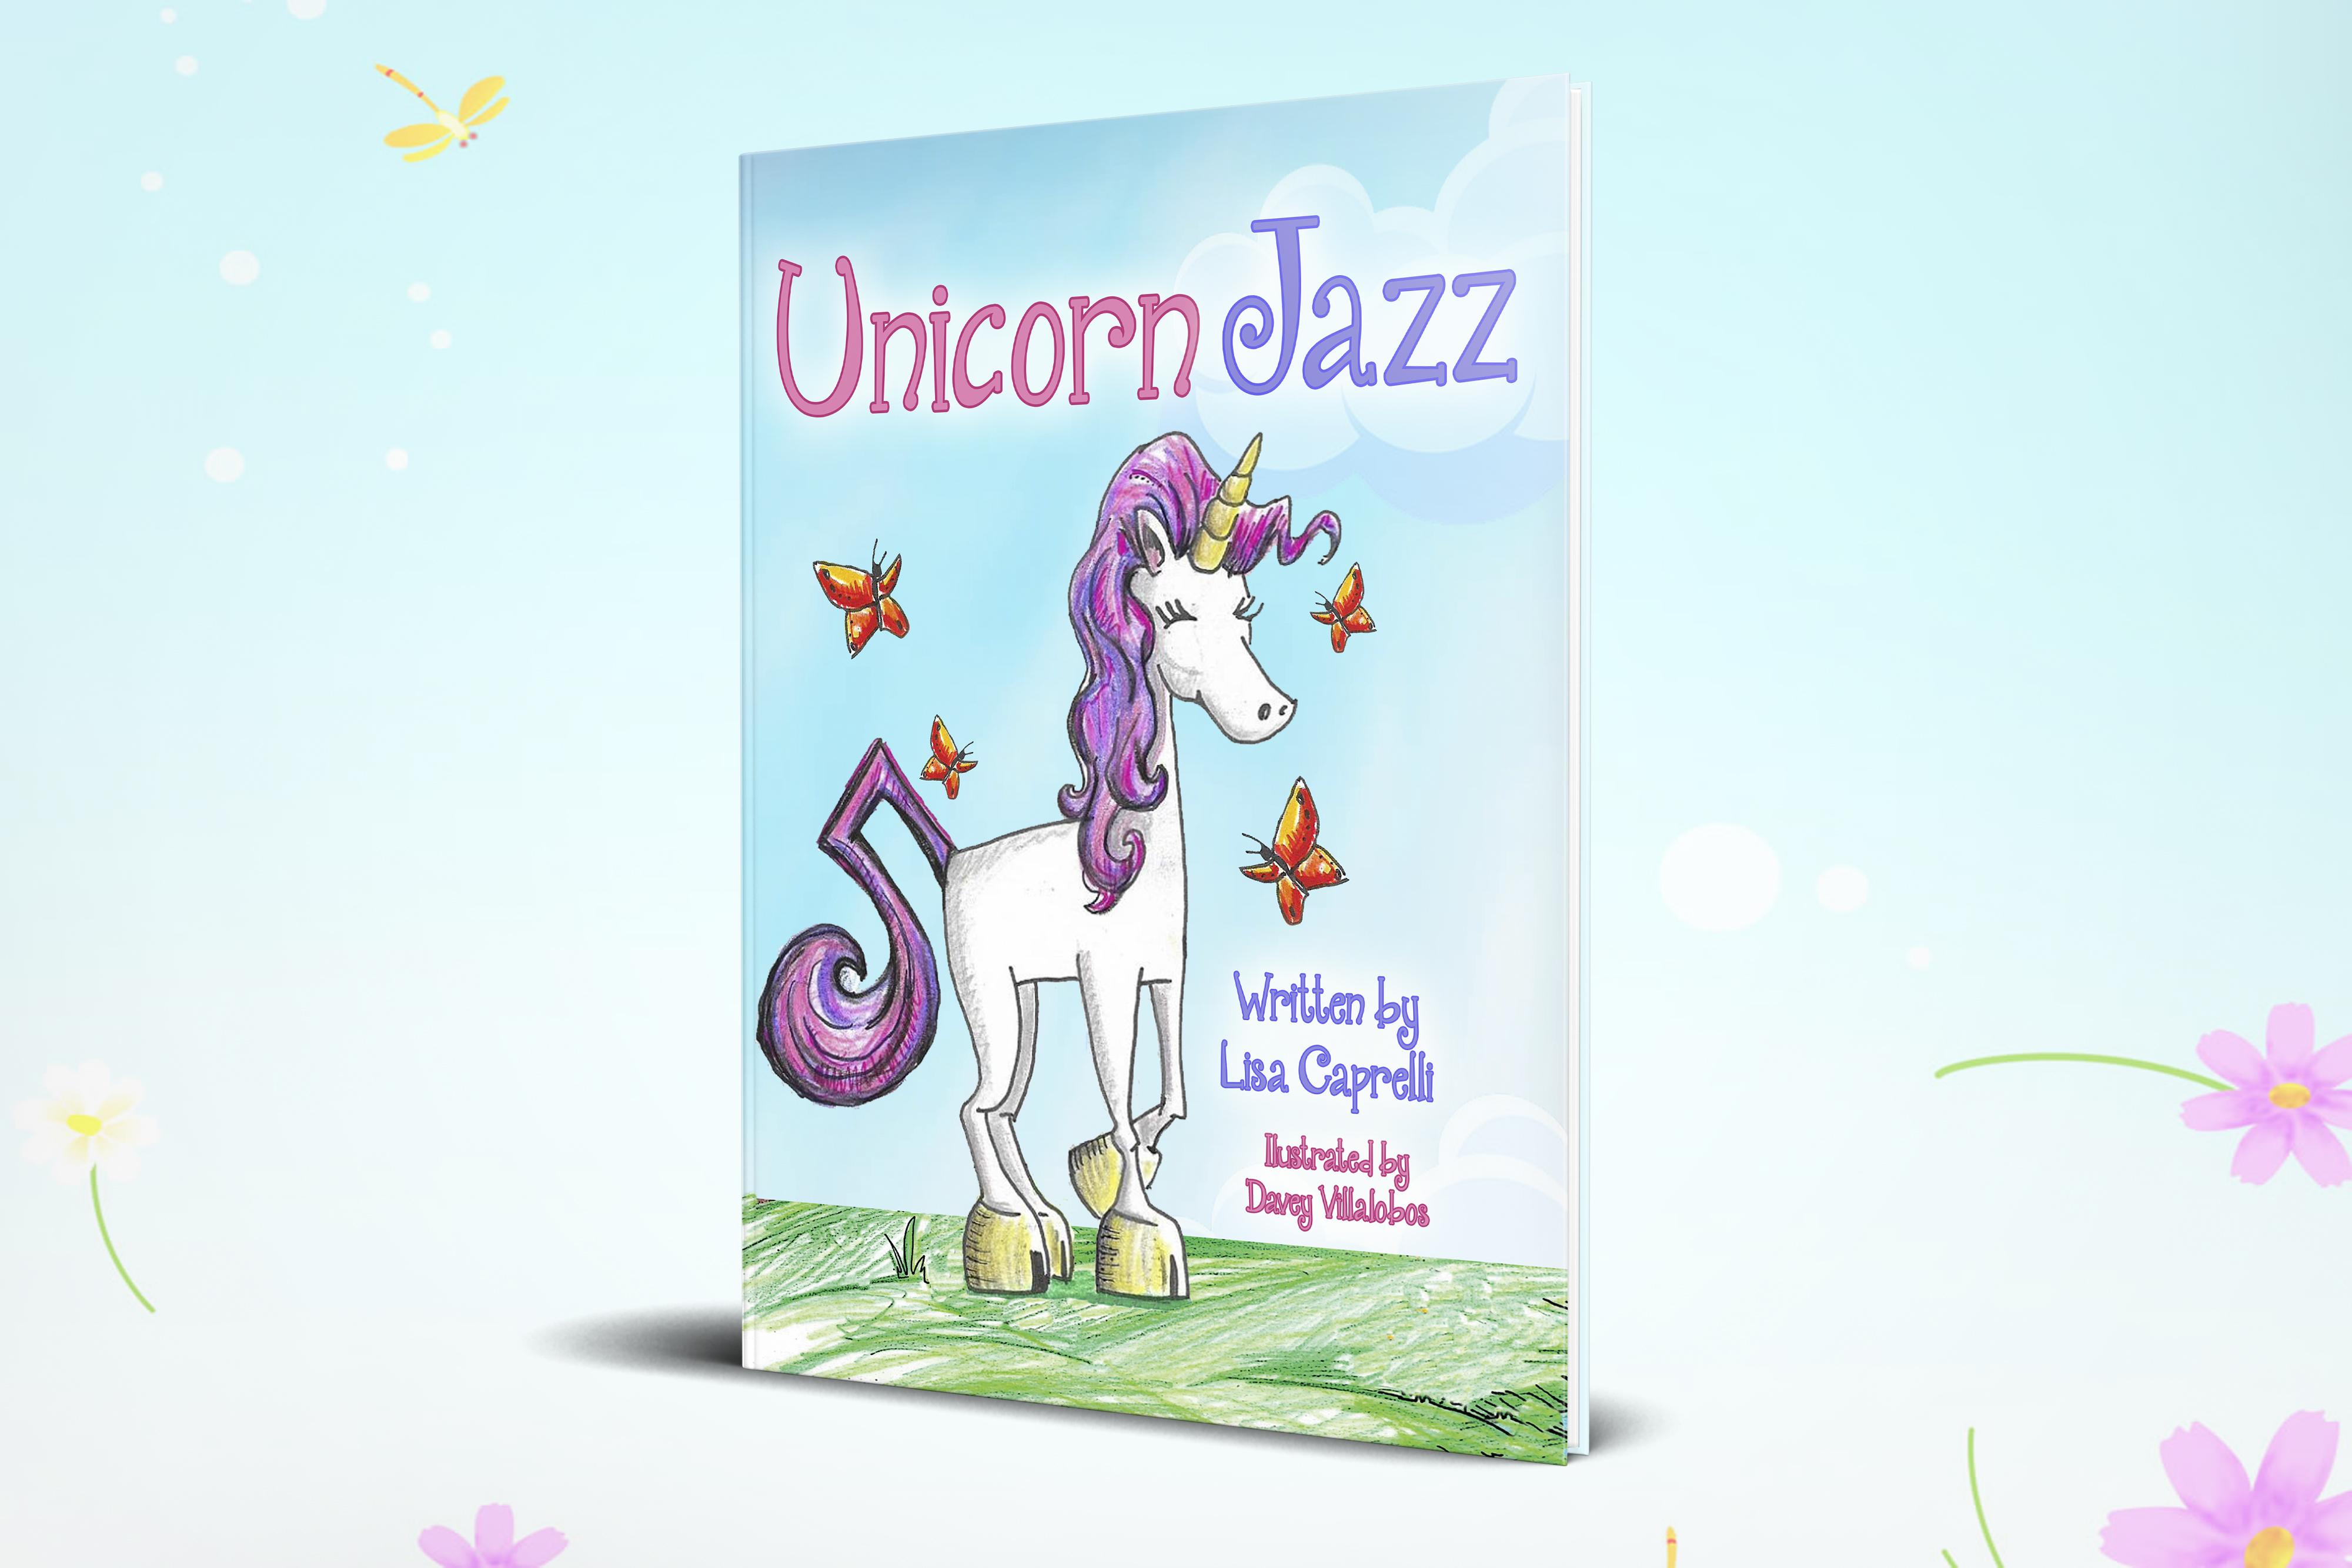 unicorn jazz author lisa caprelli